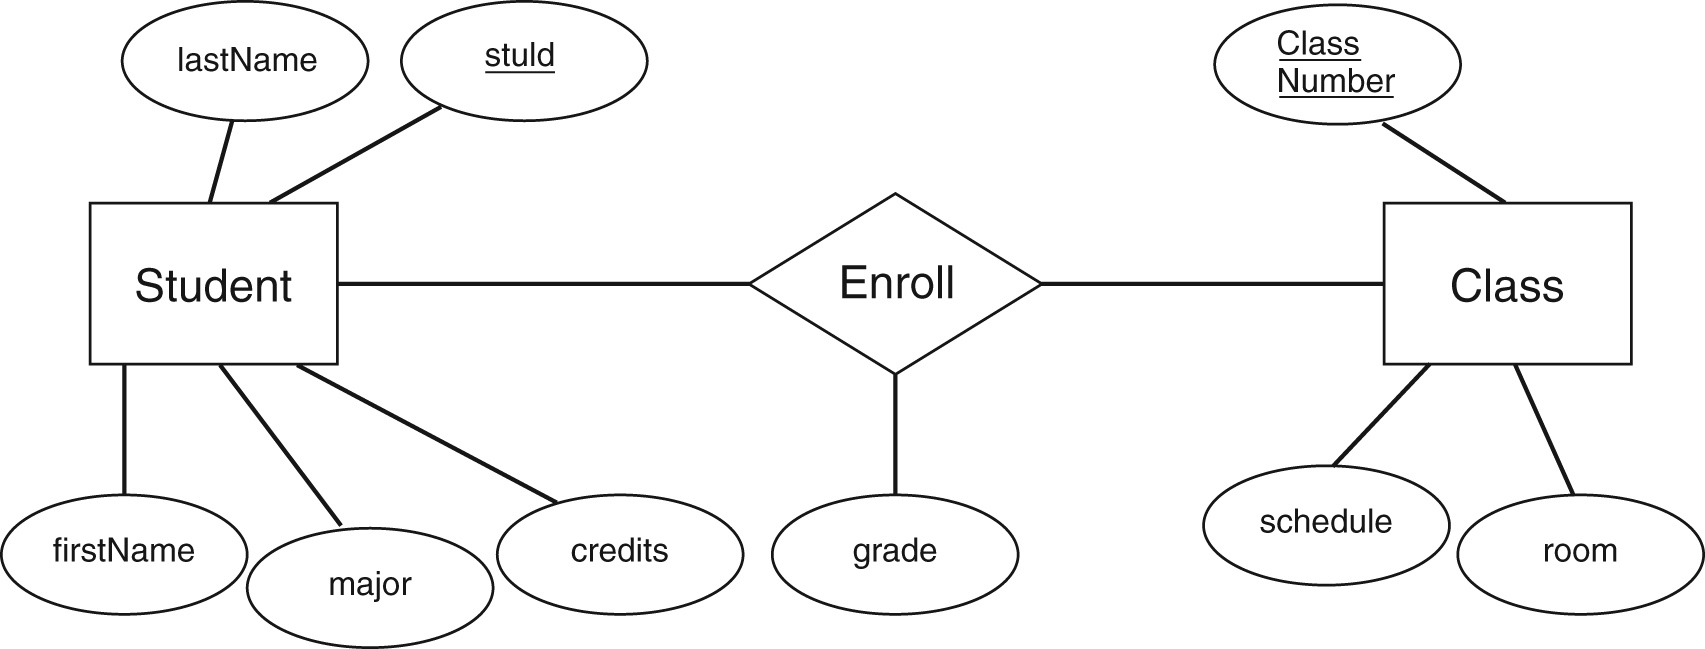 Er Diagram Dbms Examples - 9.ulrich-Temme.de • in Examples Of Er Diagram In Dbms